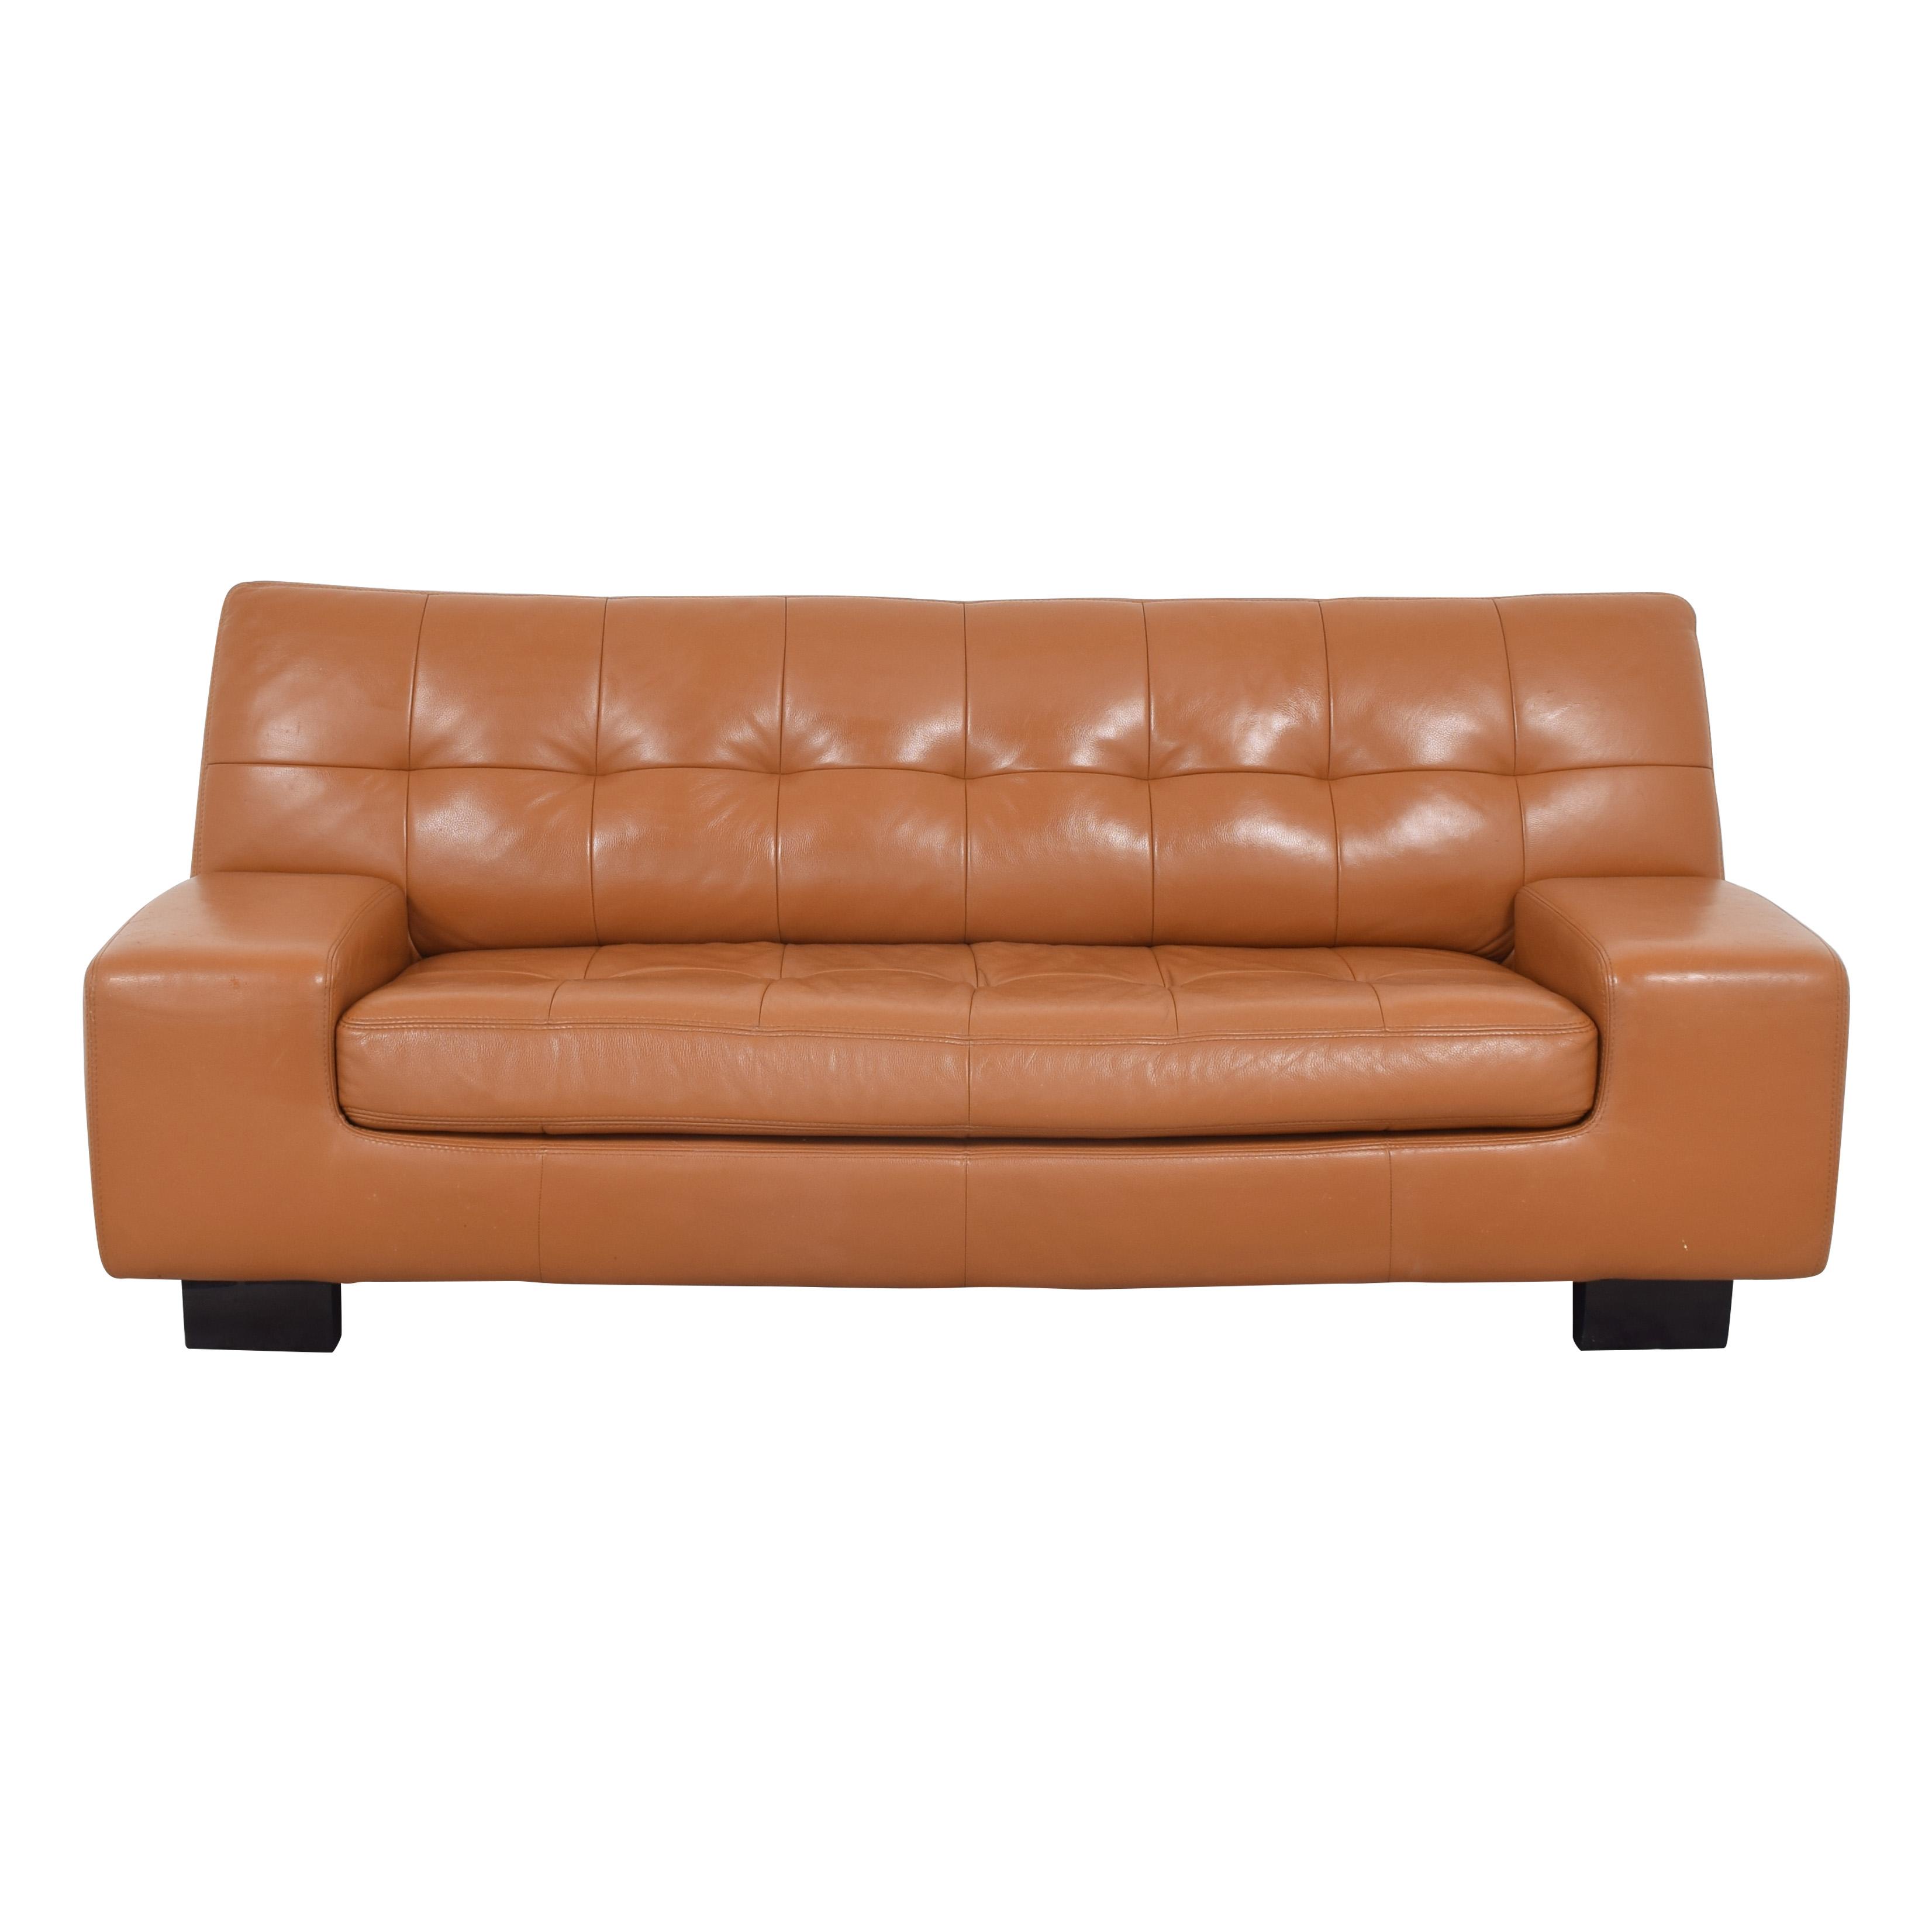 buy W Schillig Mandalay Sofa W. Schillig Classic Sofas